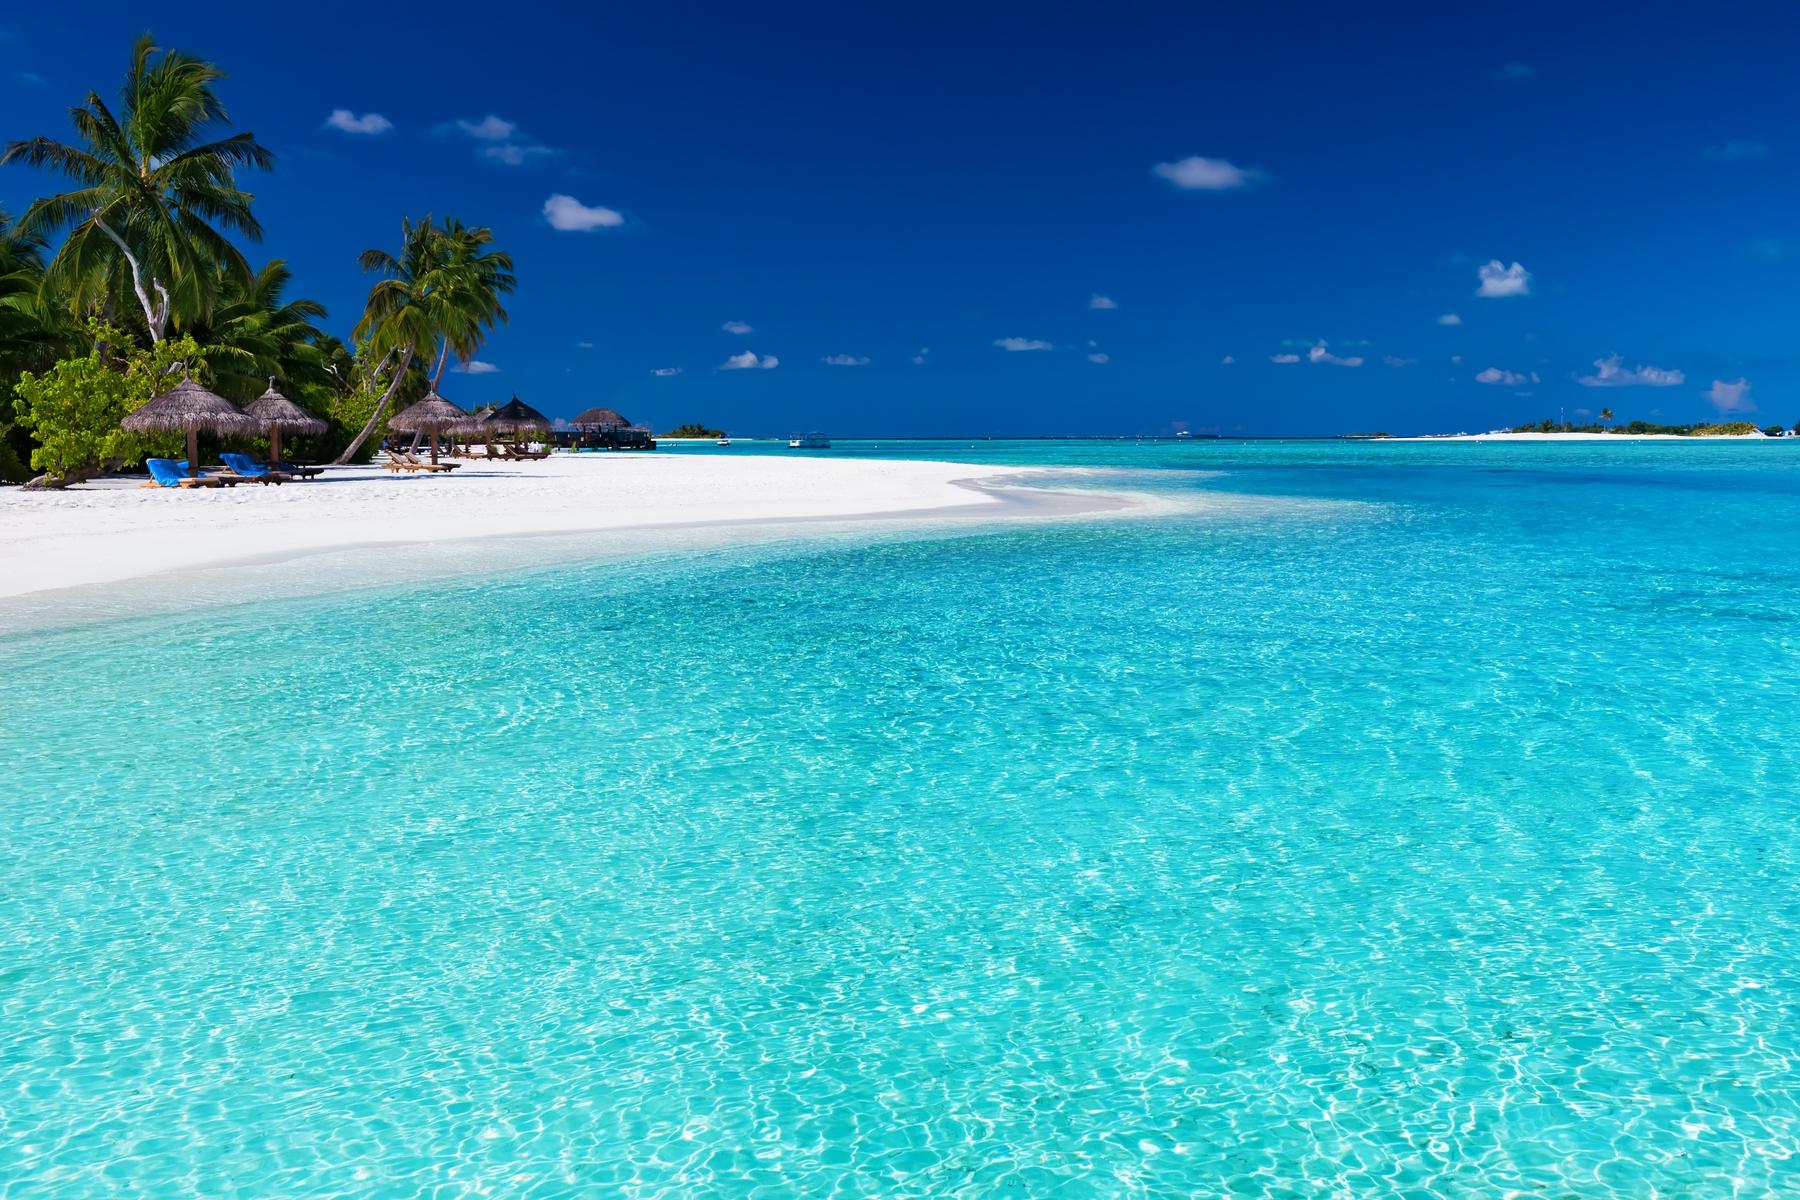 Resort in the Maldives - Ireland Public Holidays 2020